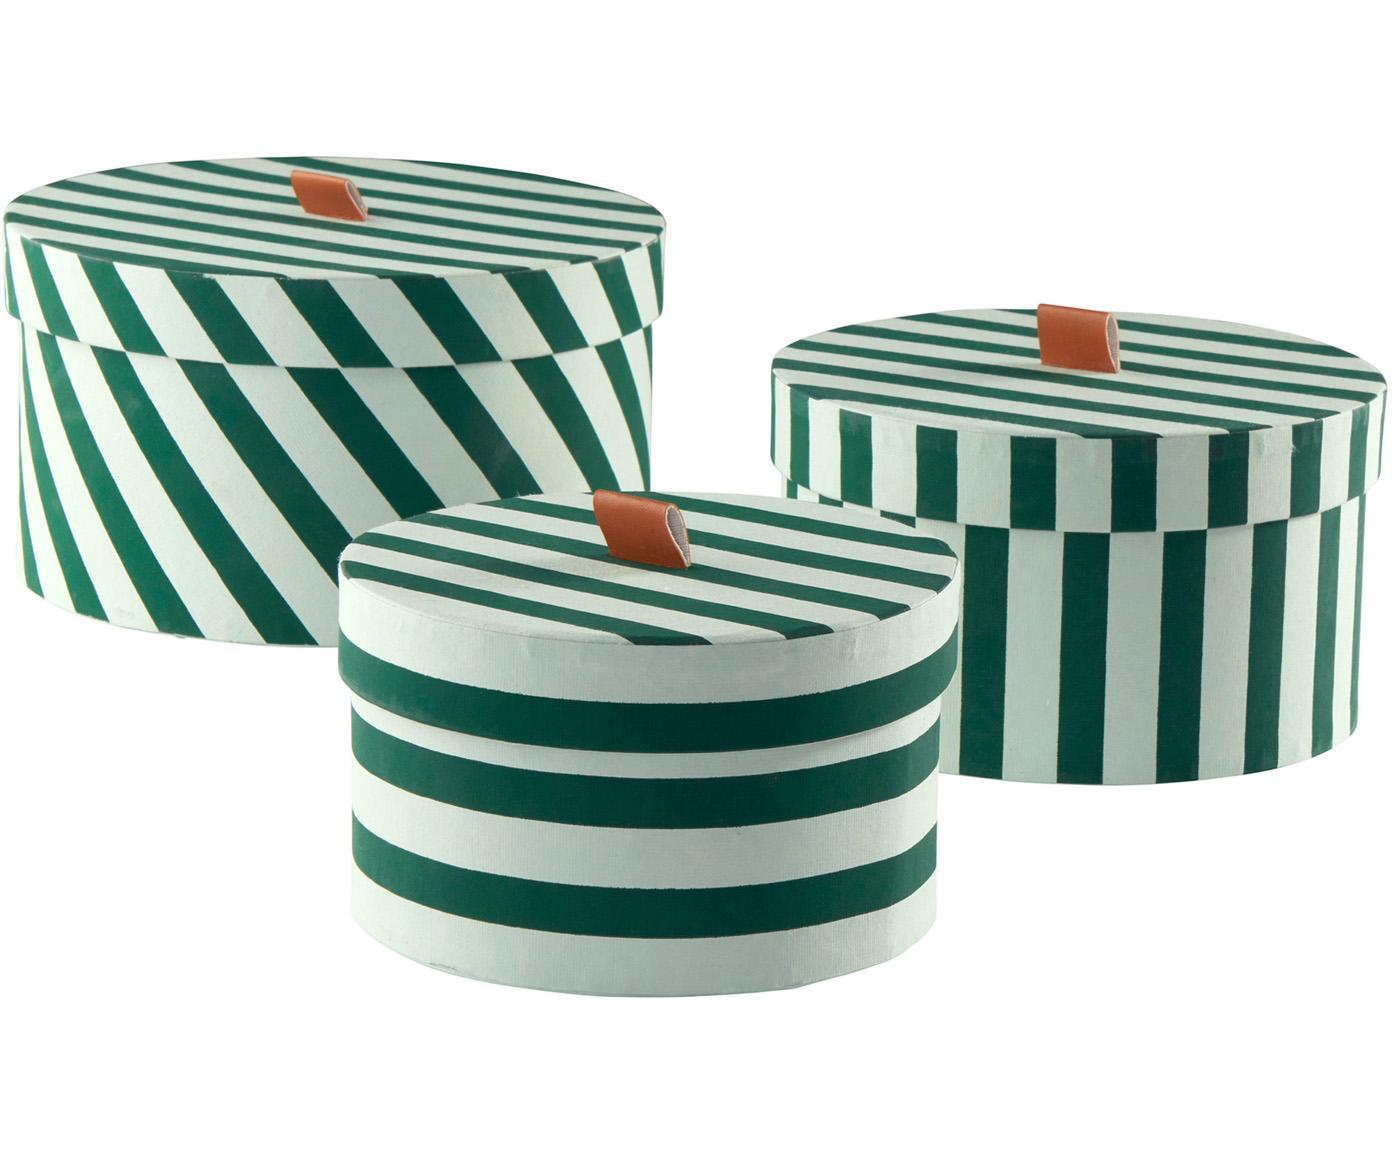 Opbergdozenset Dizzy, 3-delig, Karton, Groen, Verschillende formaten